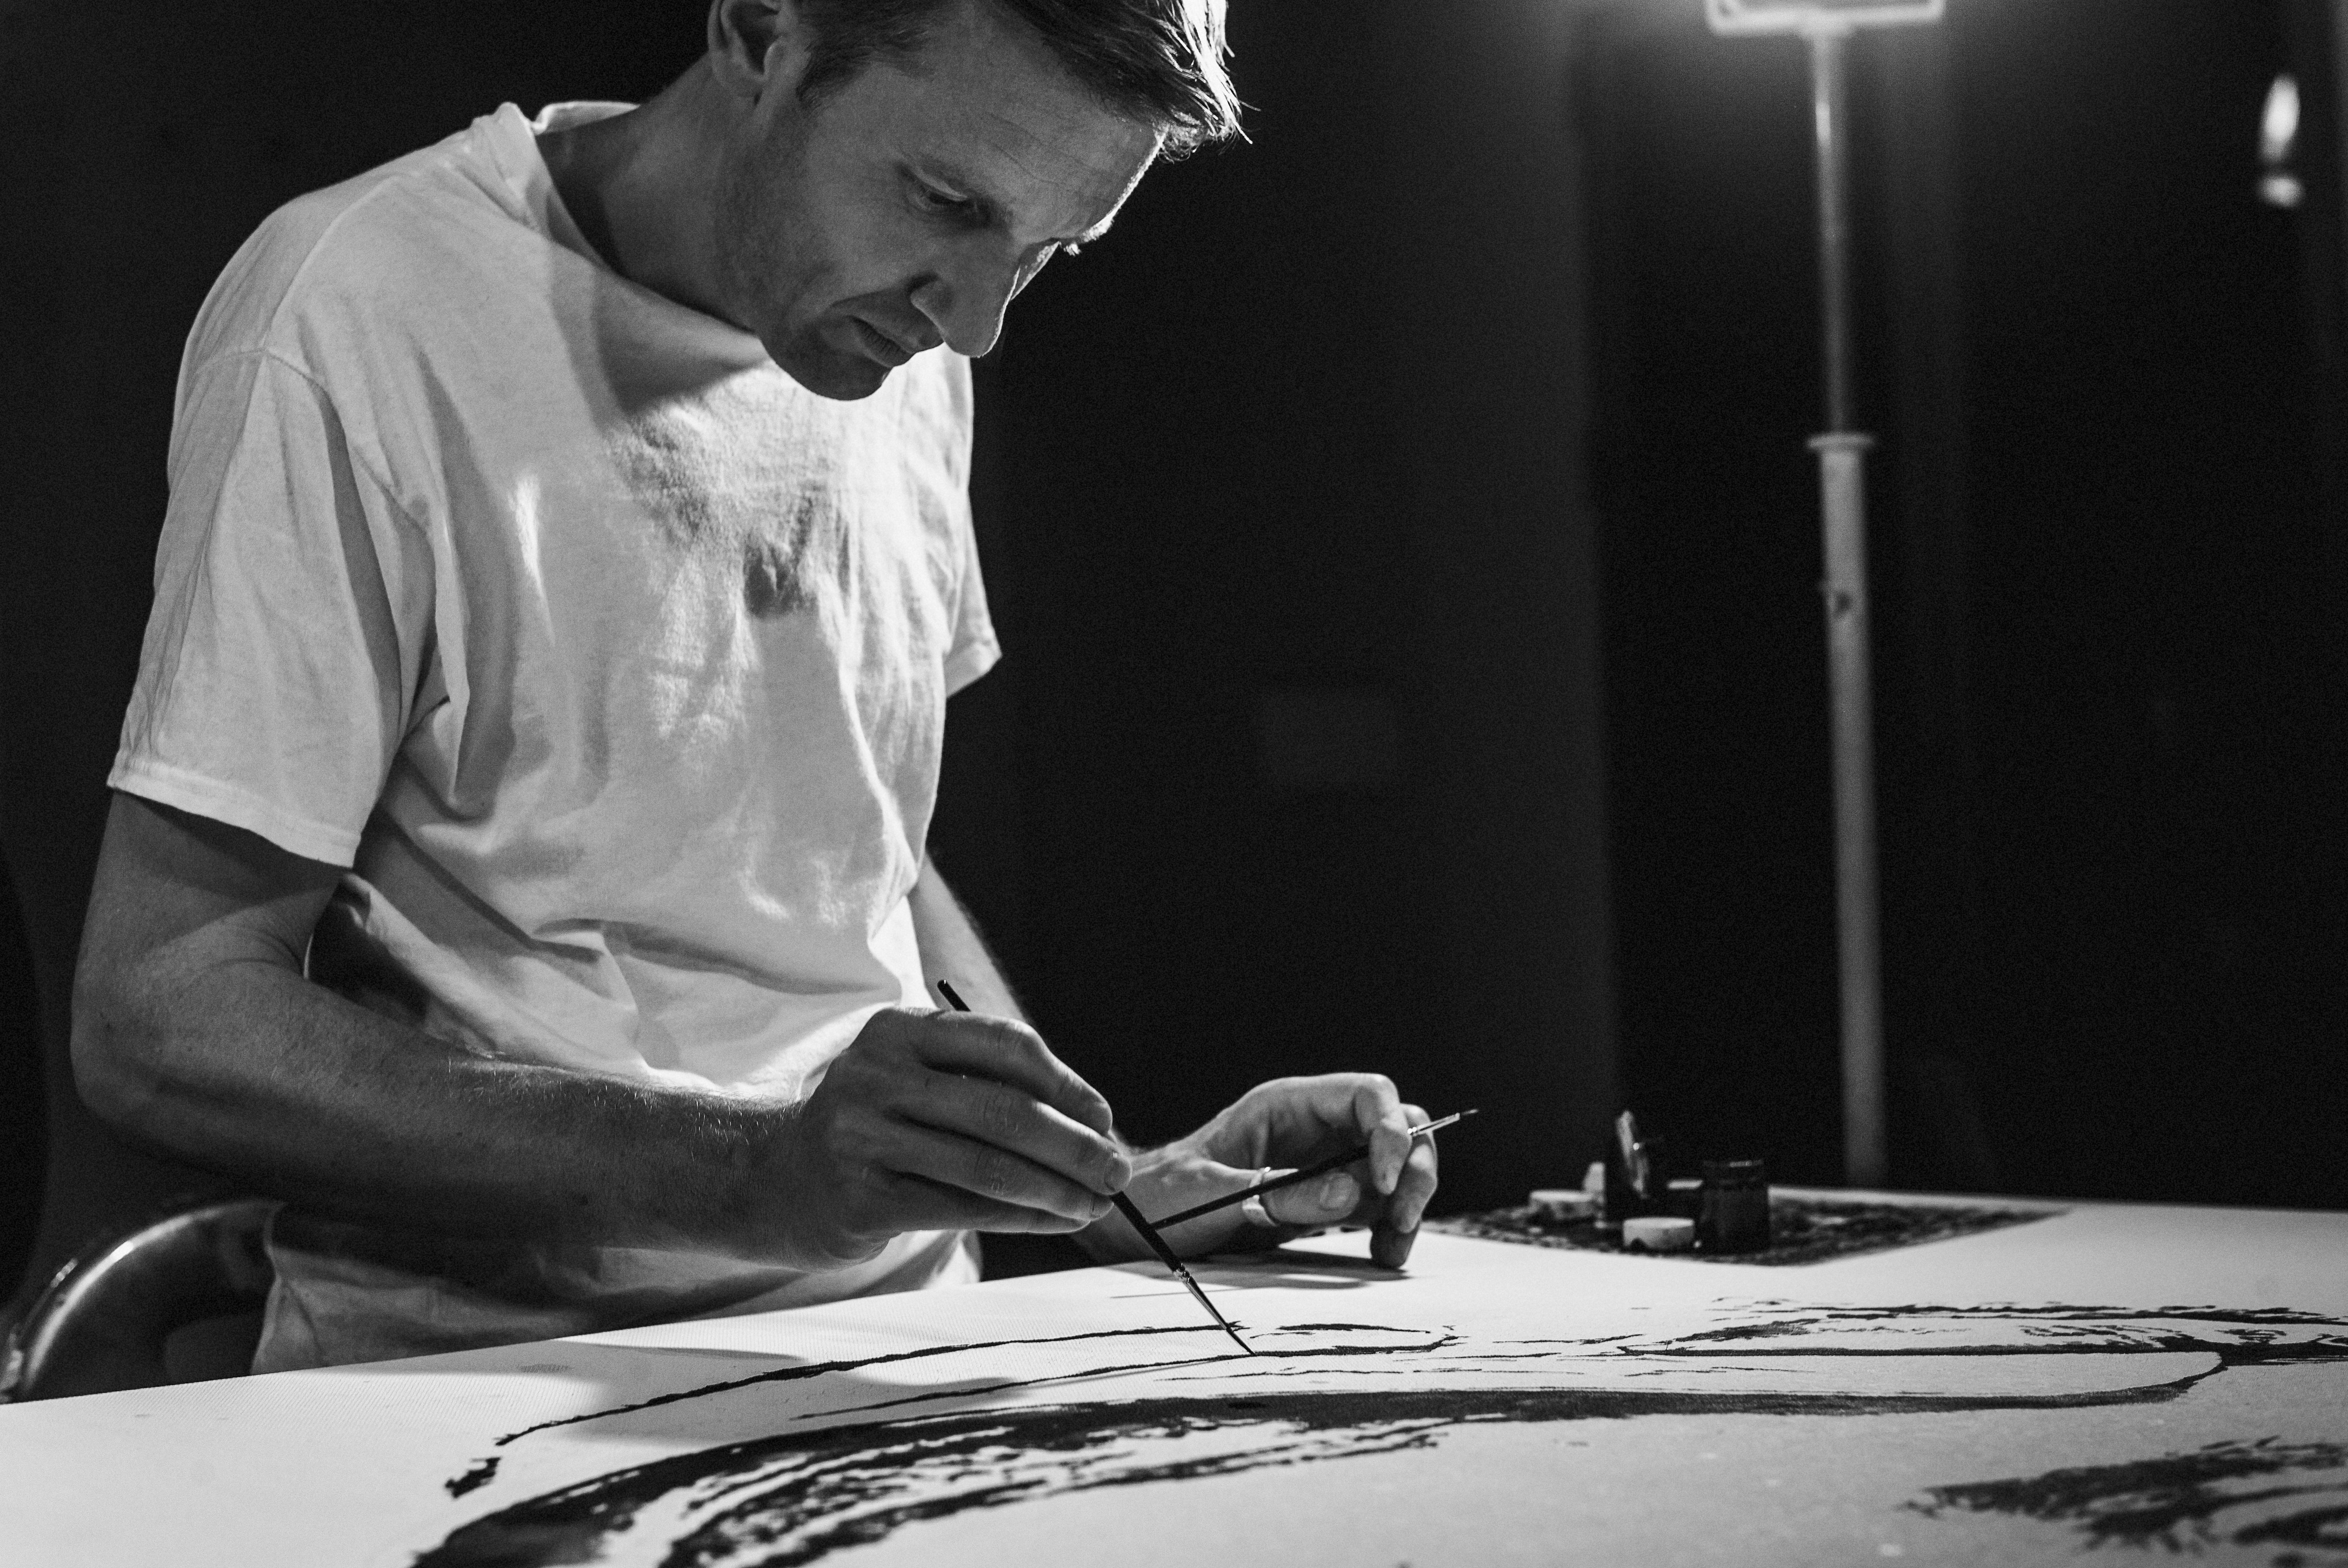 Hendrik Beikirch, studio jardin rouge montresso art foundation © Robert Winter